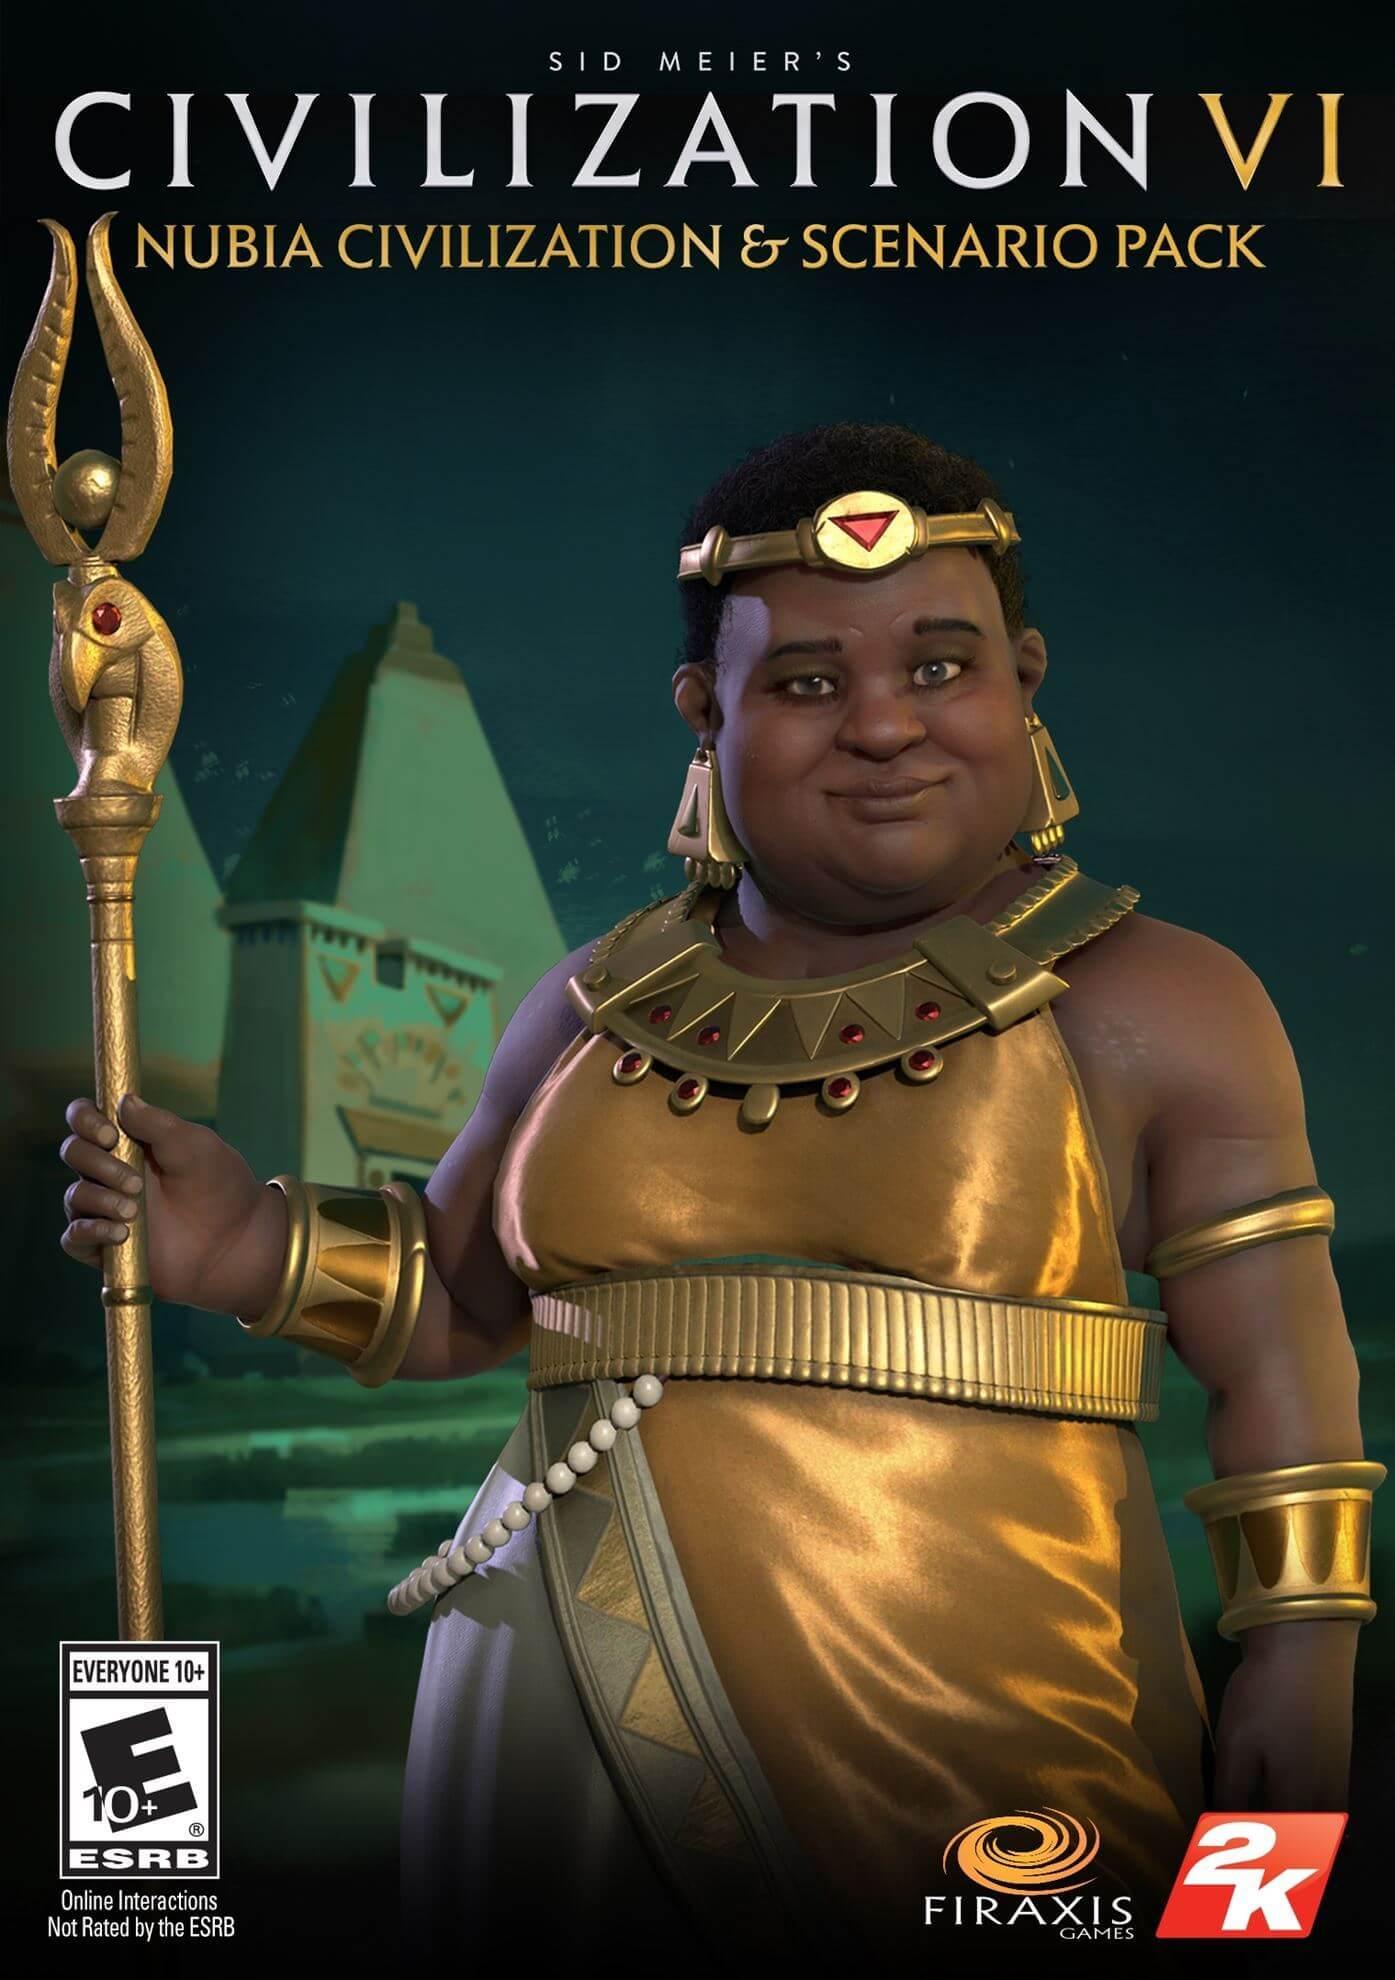 Sid Meiers Civilization VI: Nubia Civilization & Scenario Pack (WW)